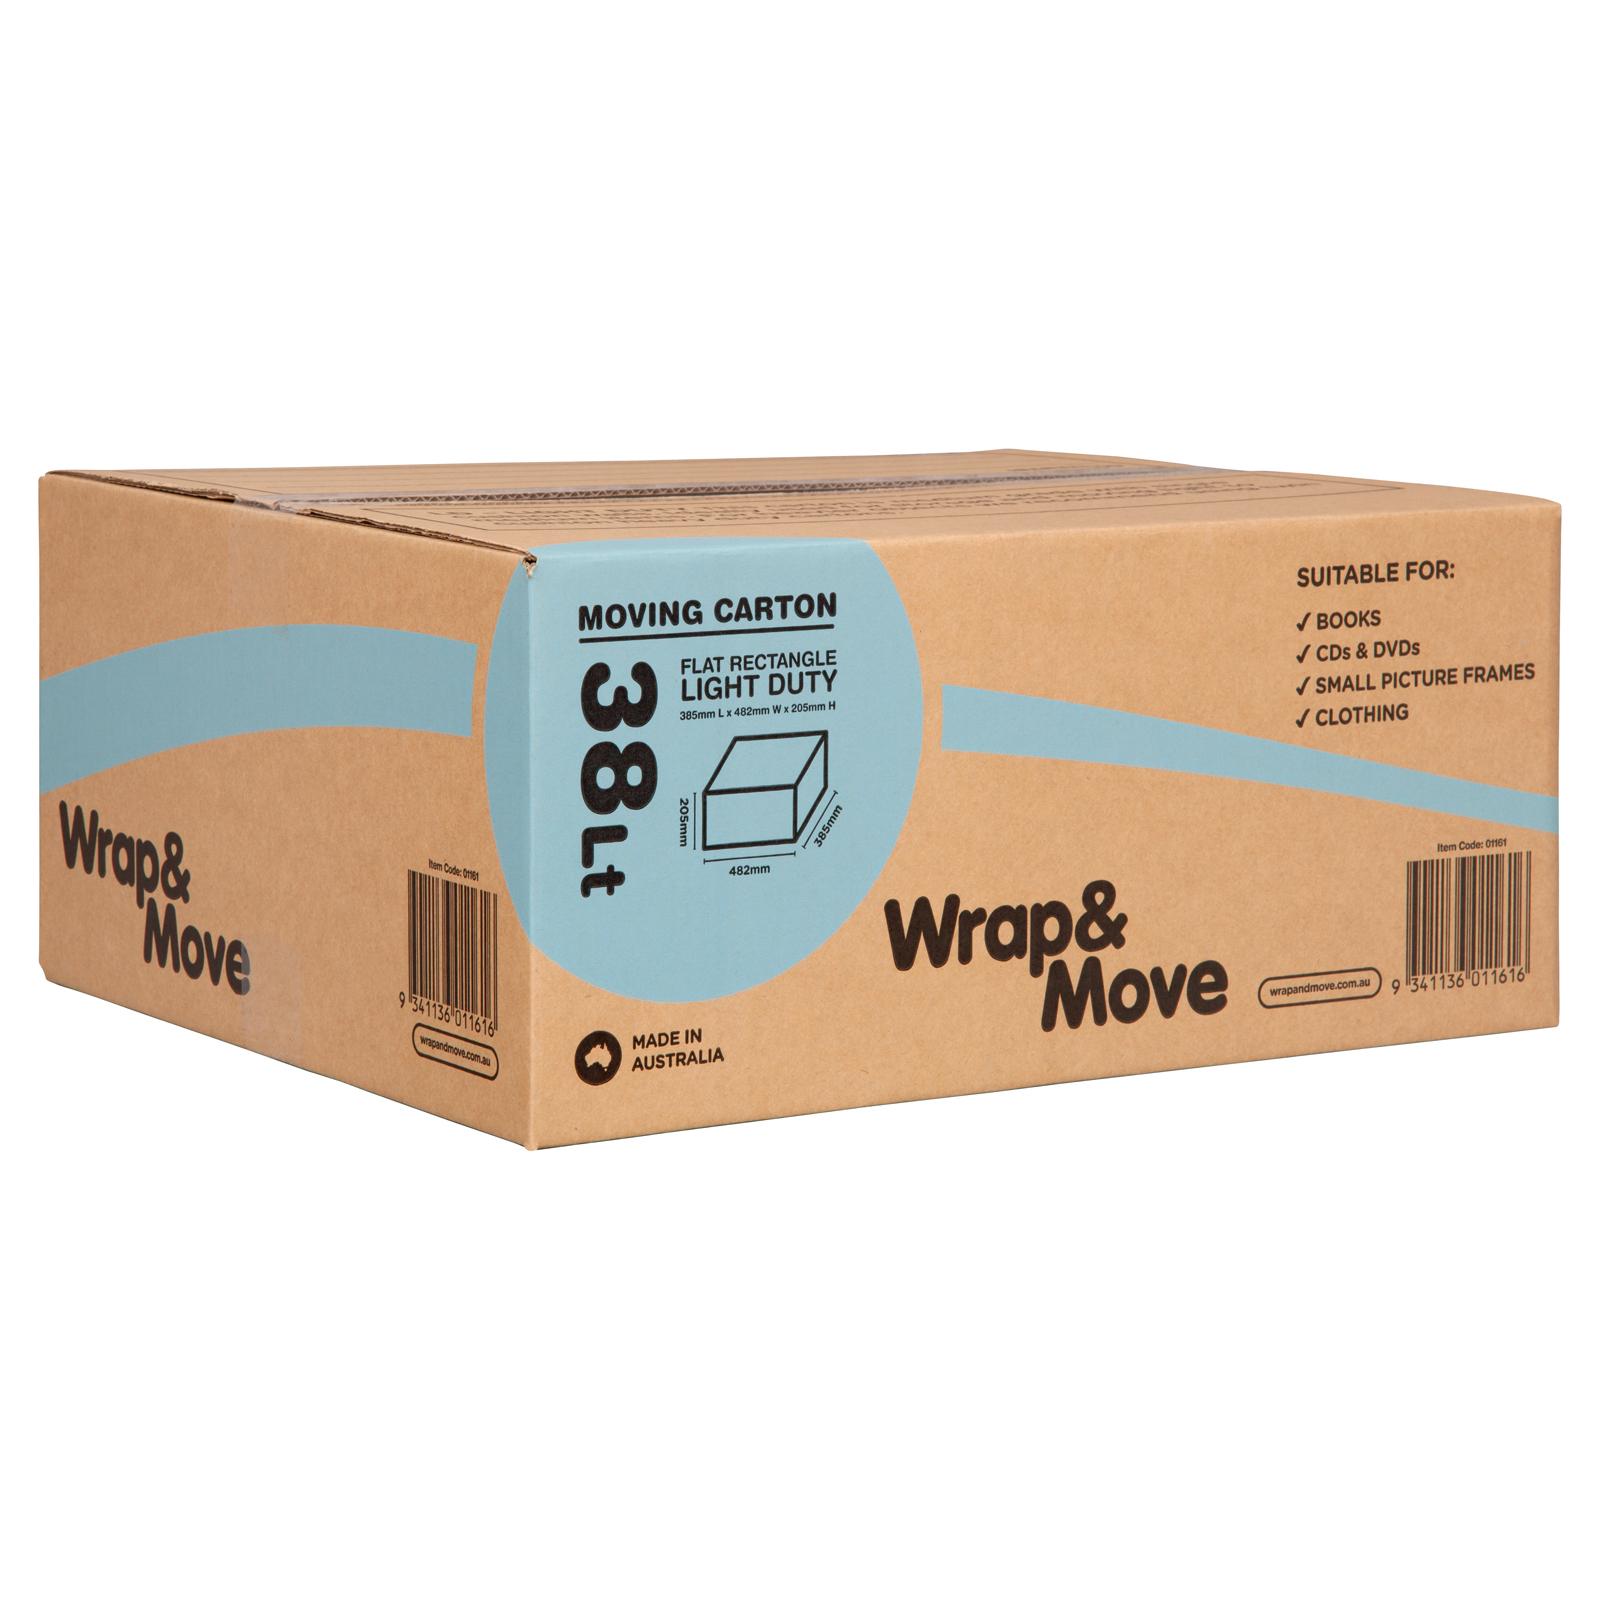 Wrap & Move 38L Light Duty Flat Rectangle Moving Carton